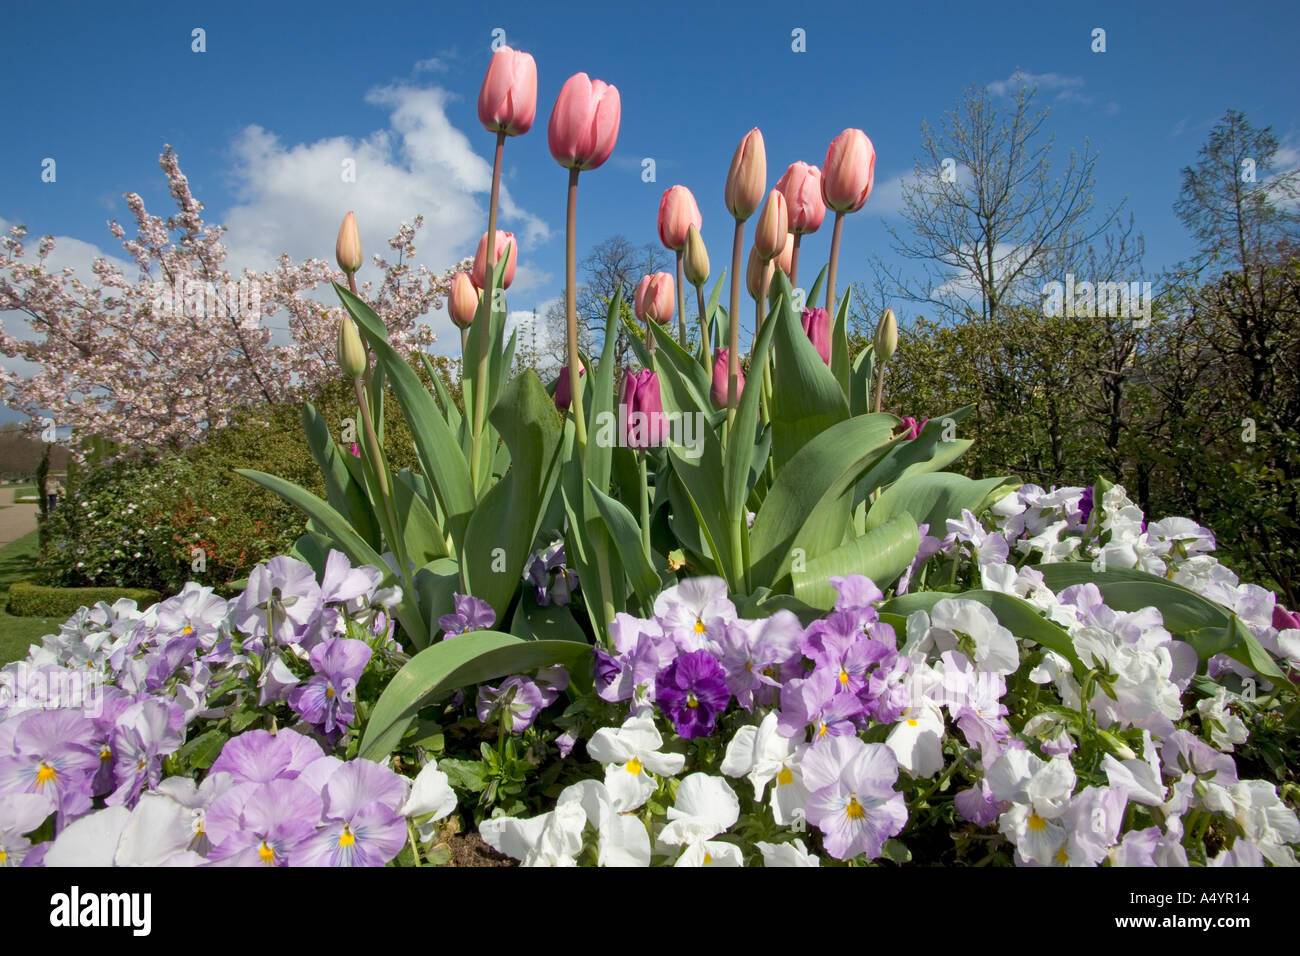 Spring flowers in regents park london uk april stock photo 3640083 spring flowers in regents park london uk april mightylinksfo